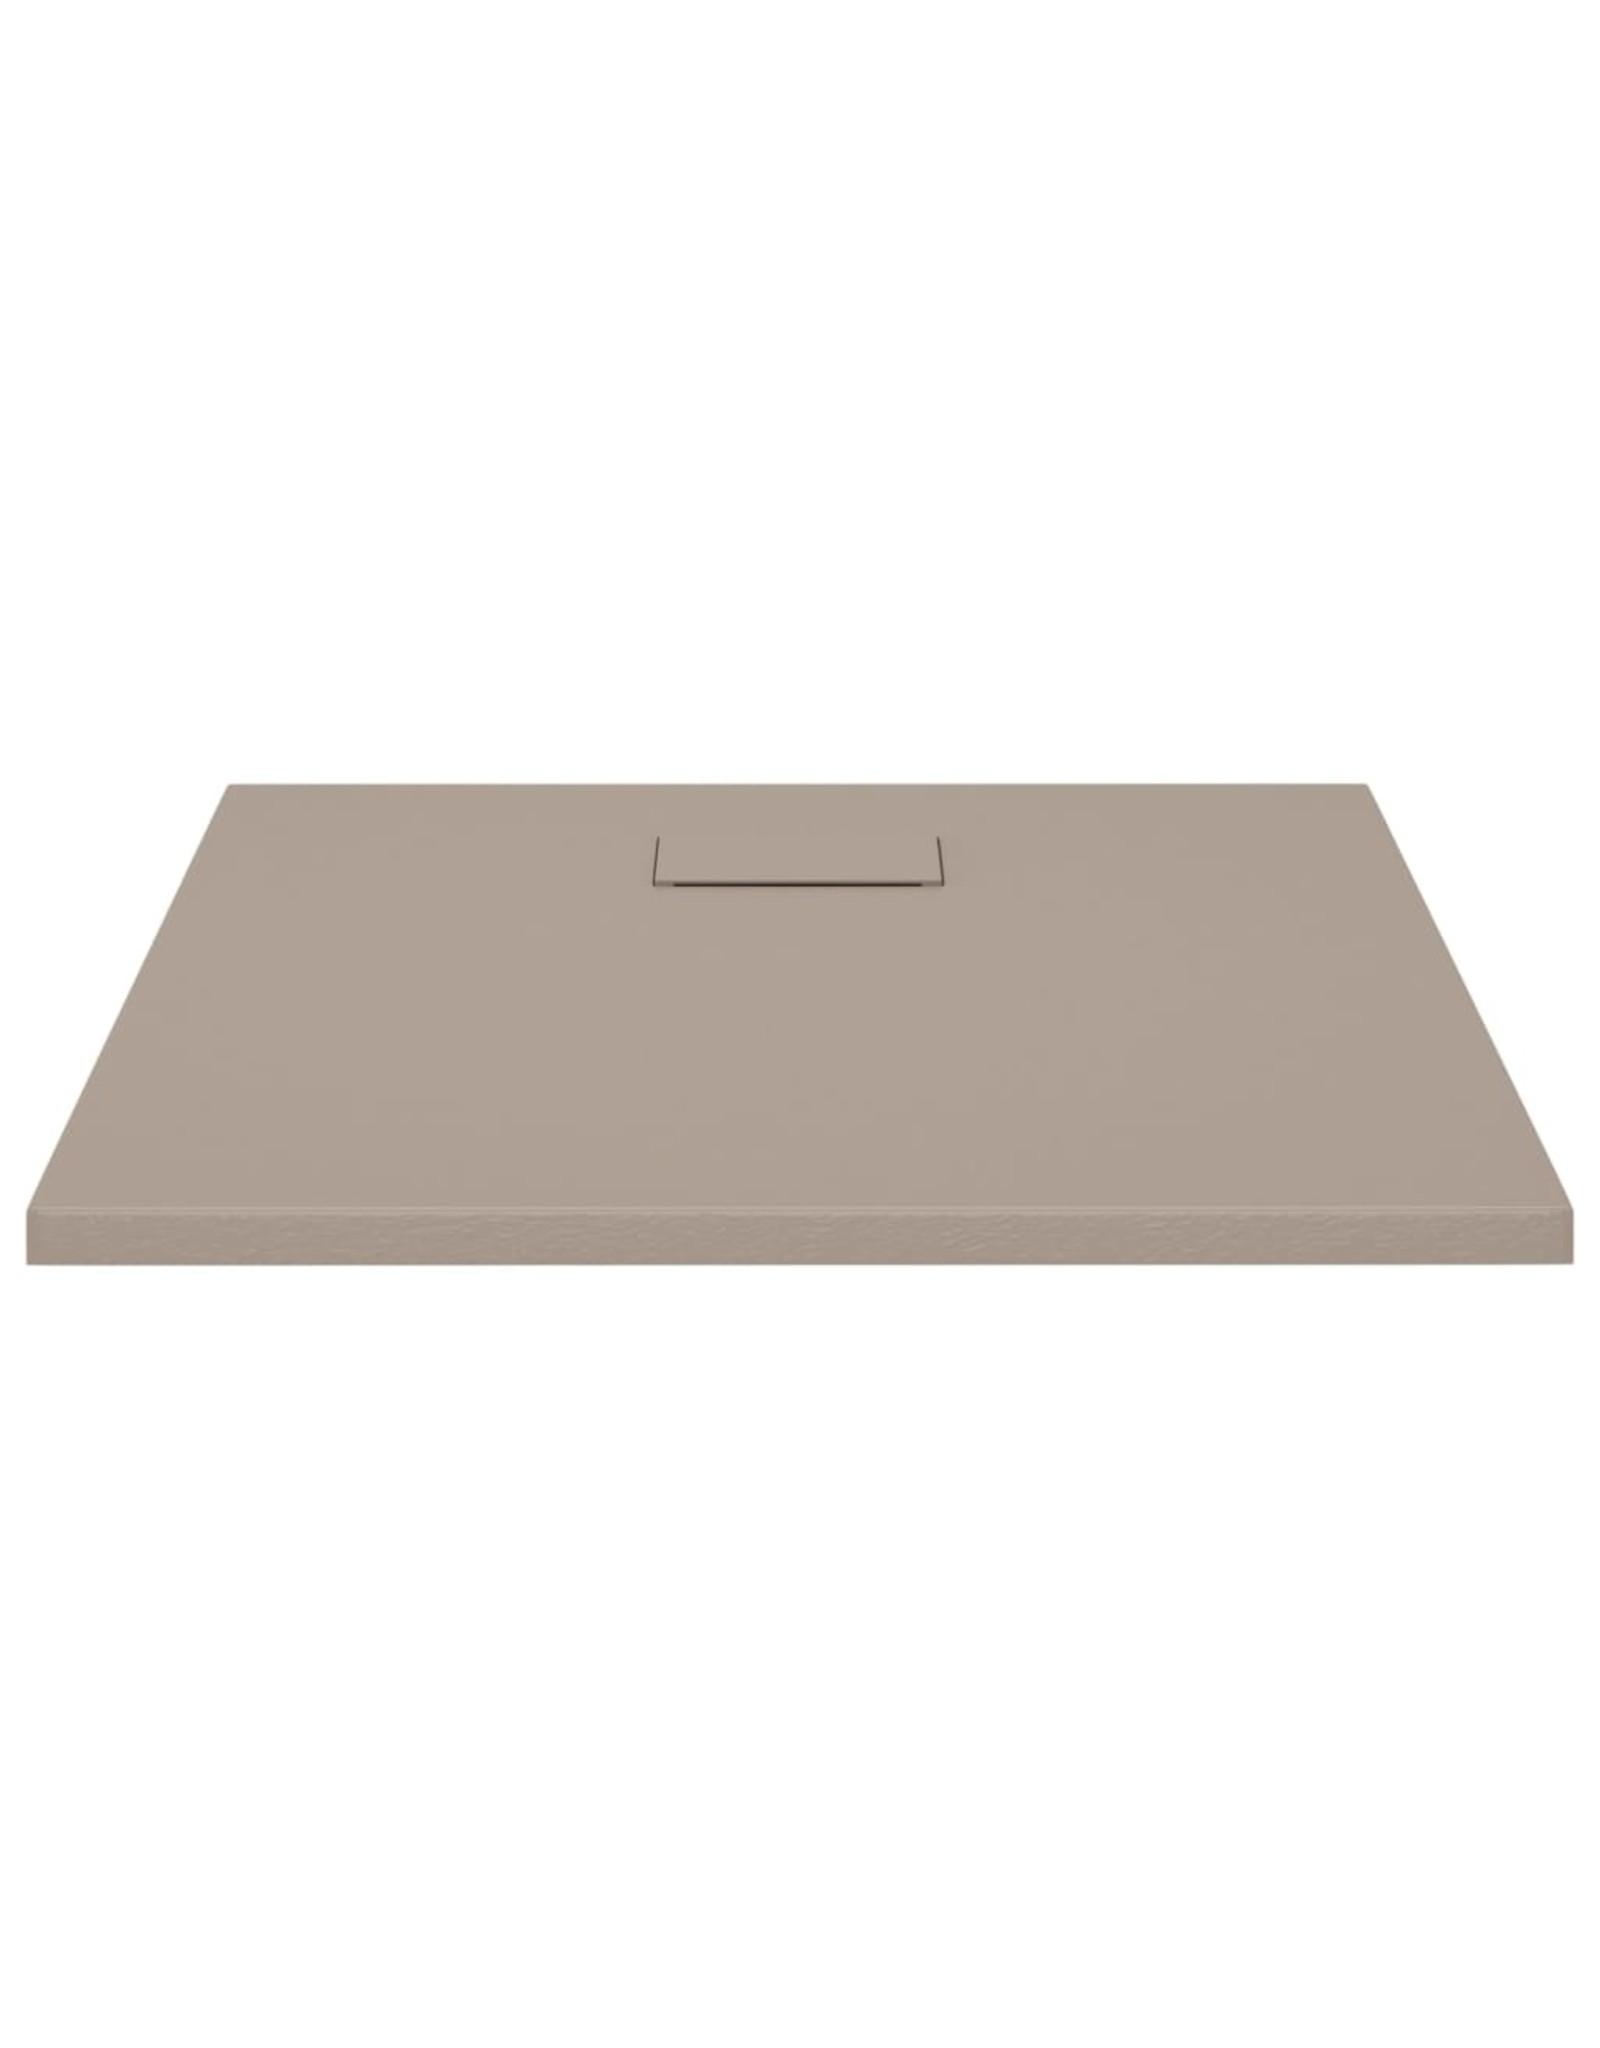 Douchebak 80x80 cm SMC bruin